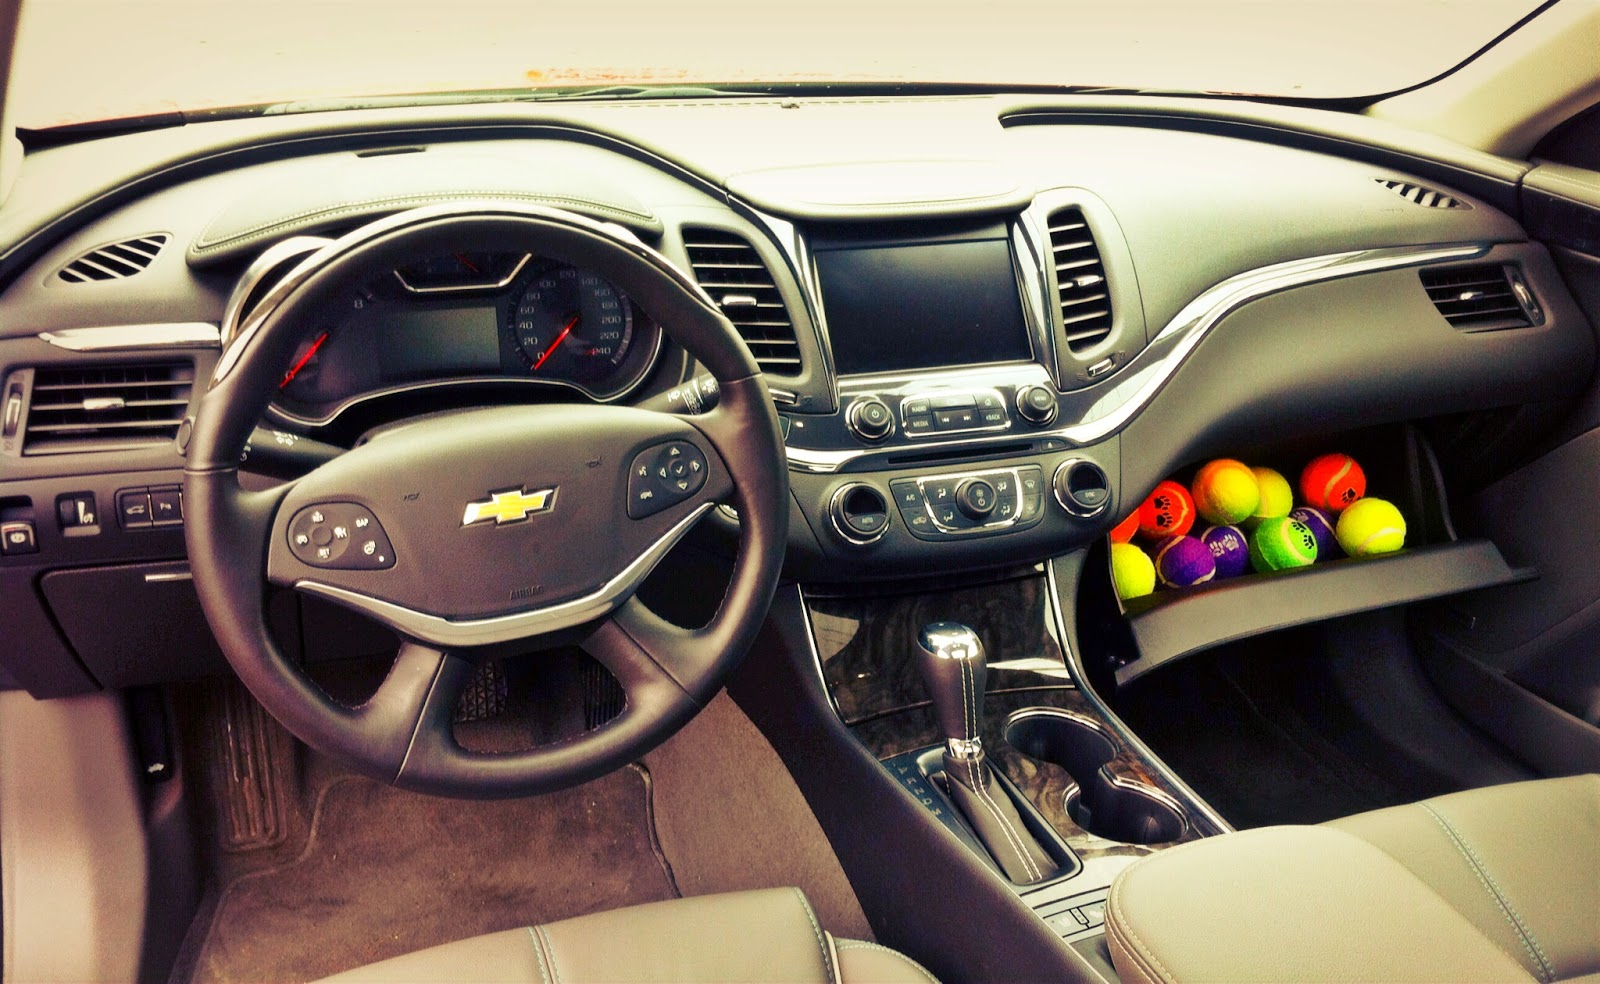 2014 Chevrolet Impala LTZ interior